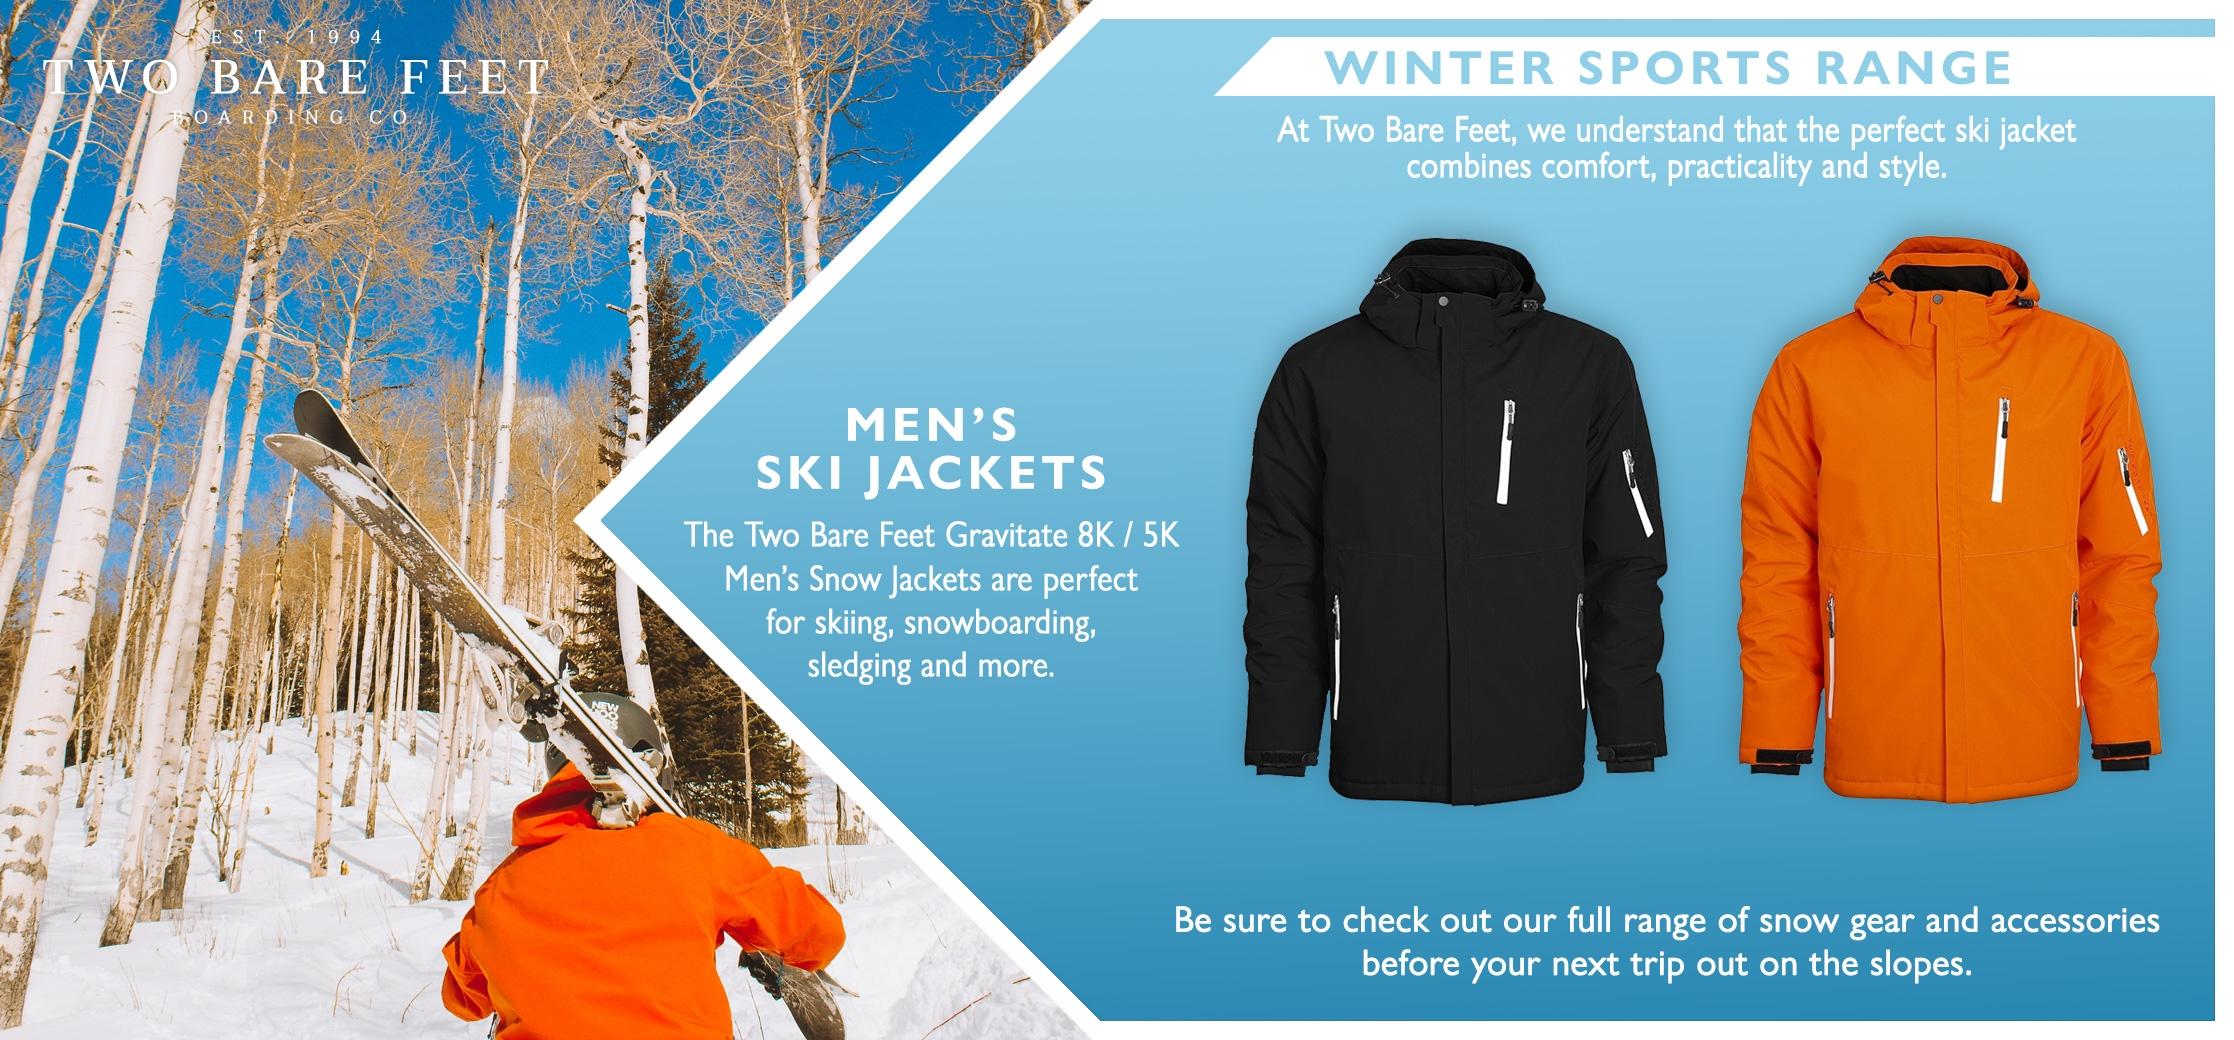 Men's ski jackets and winter sports range